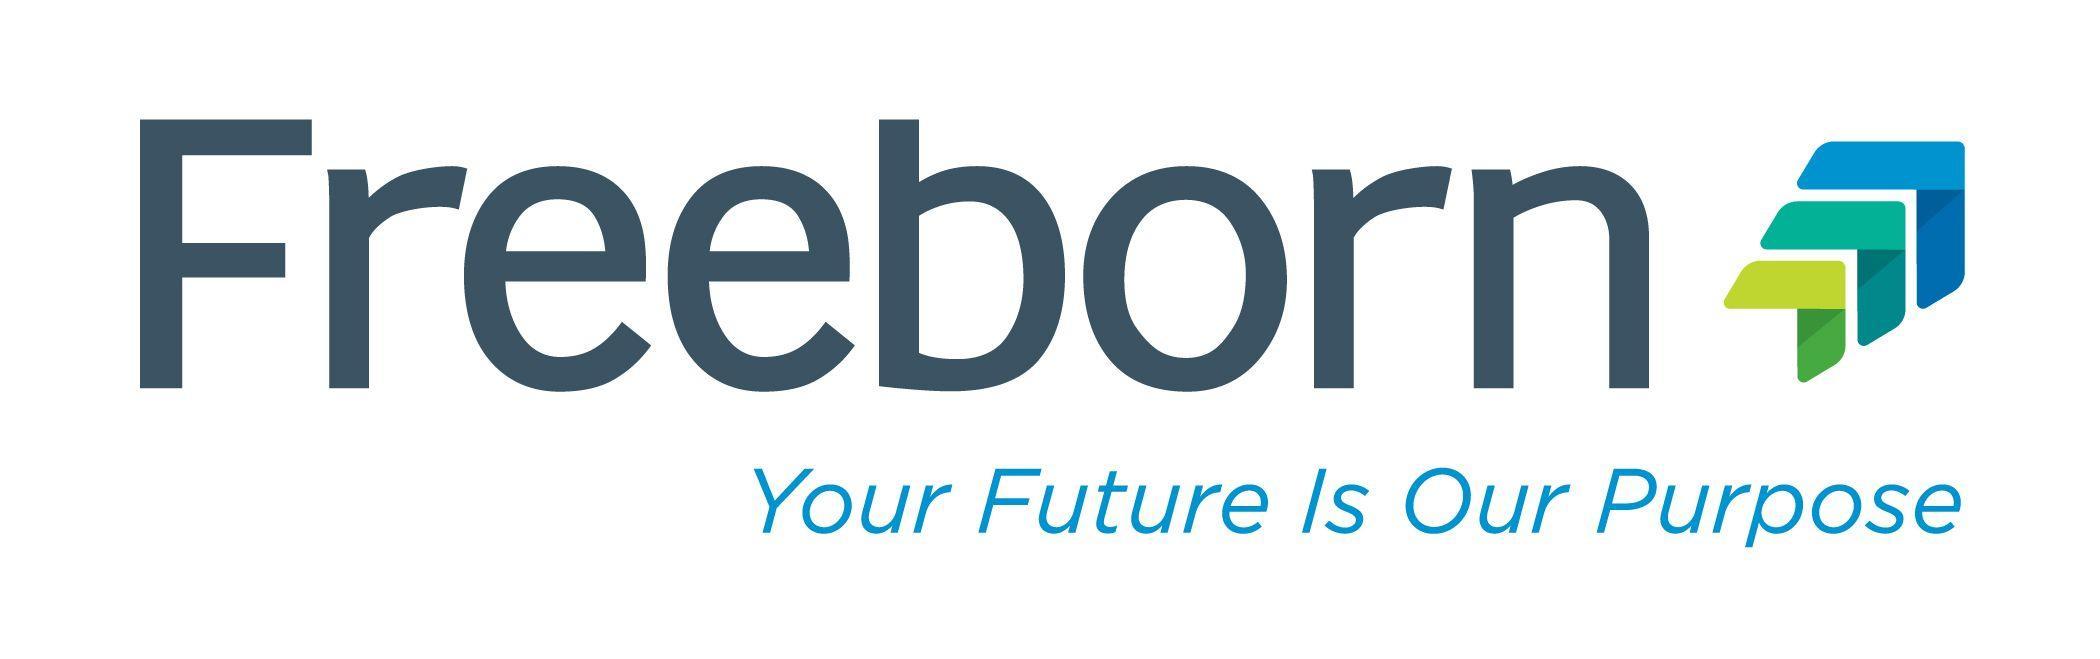 Freeborn Peters Logo